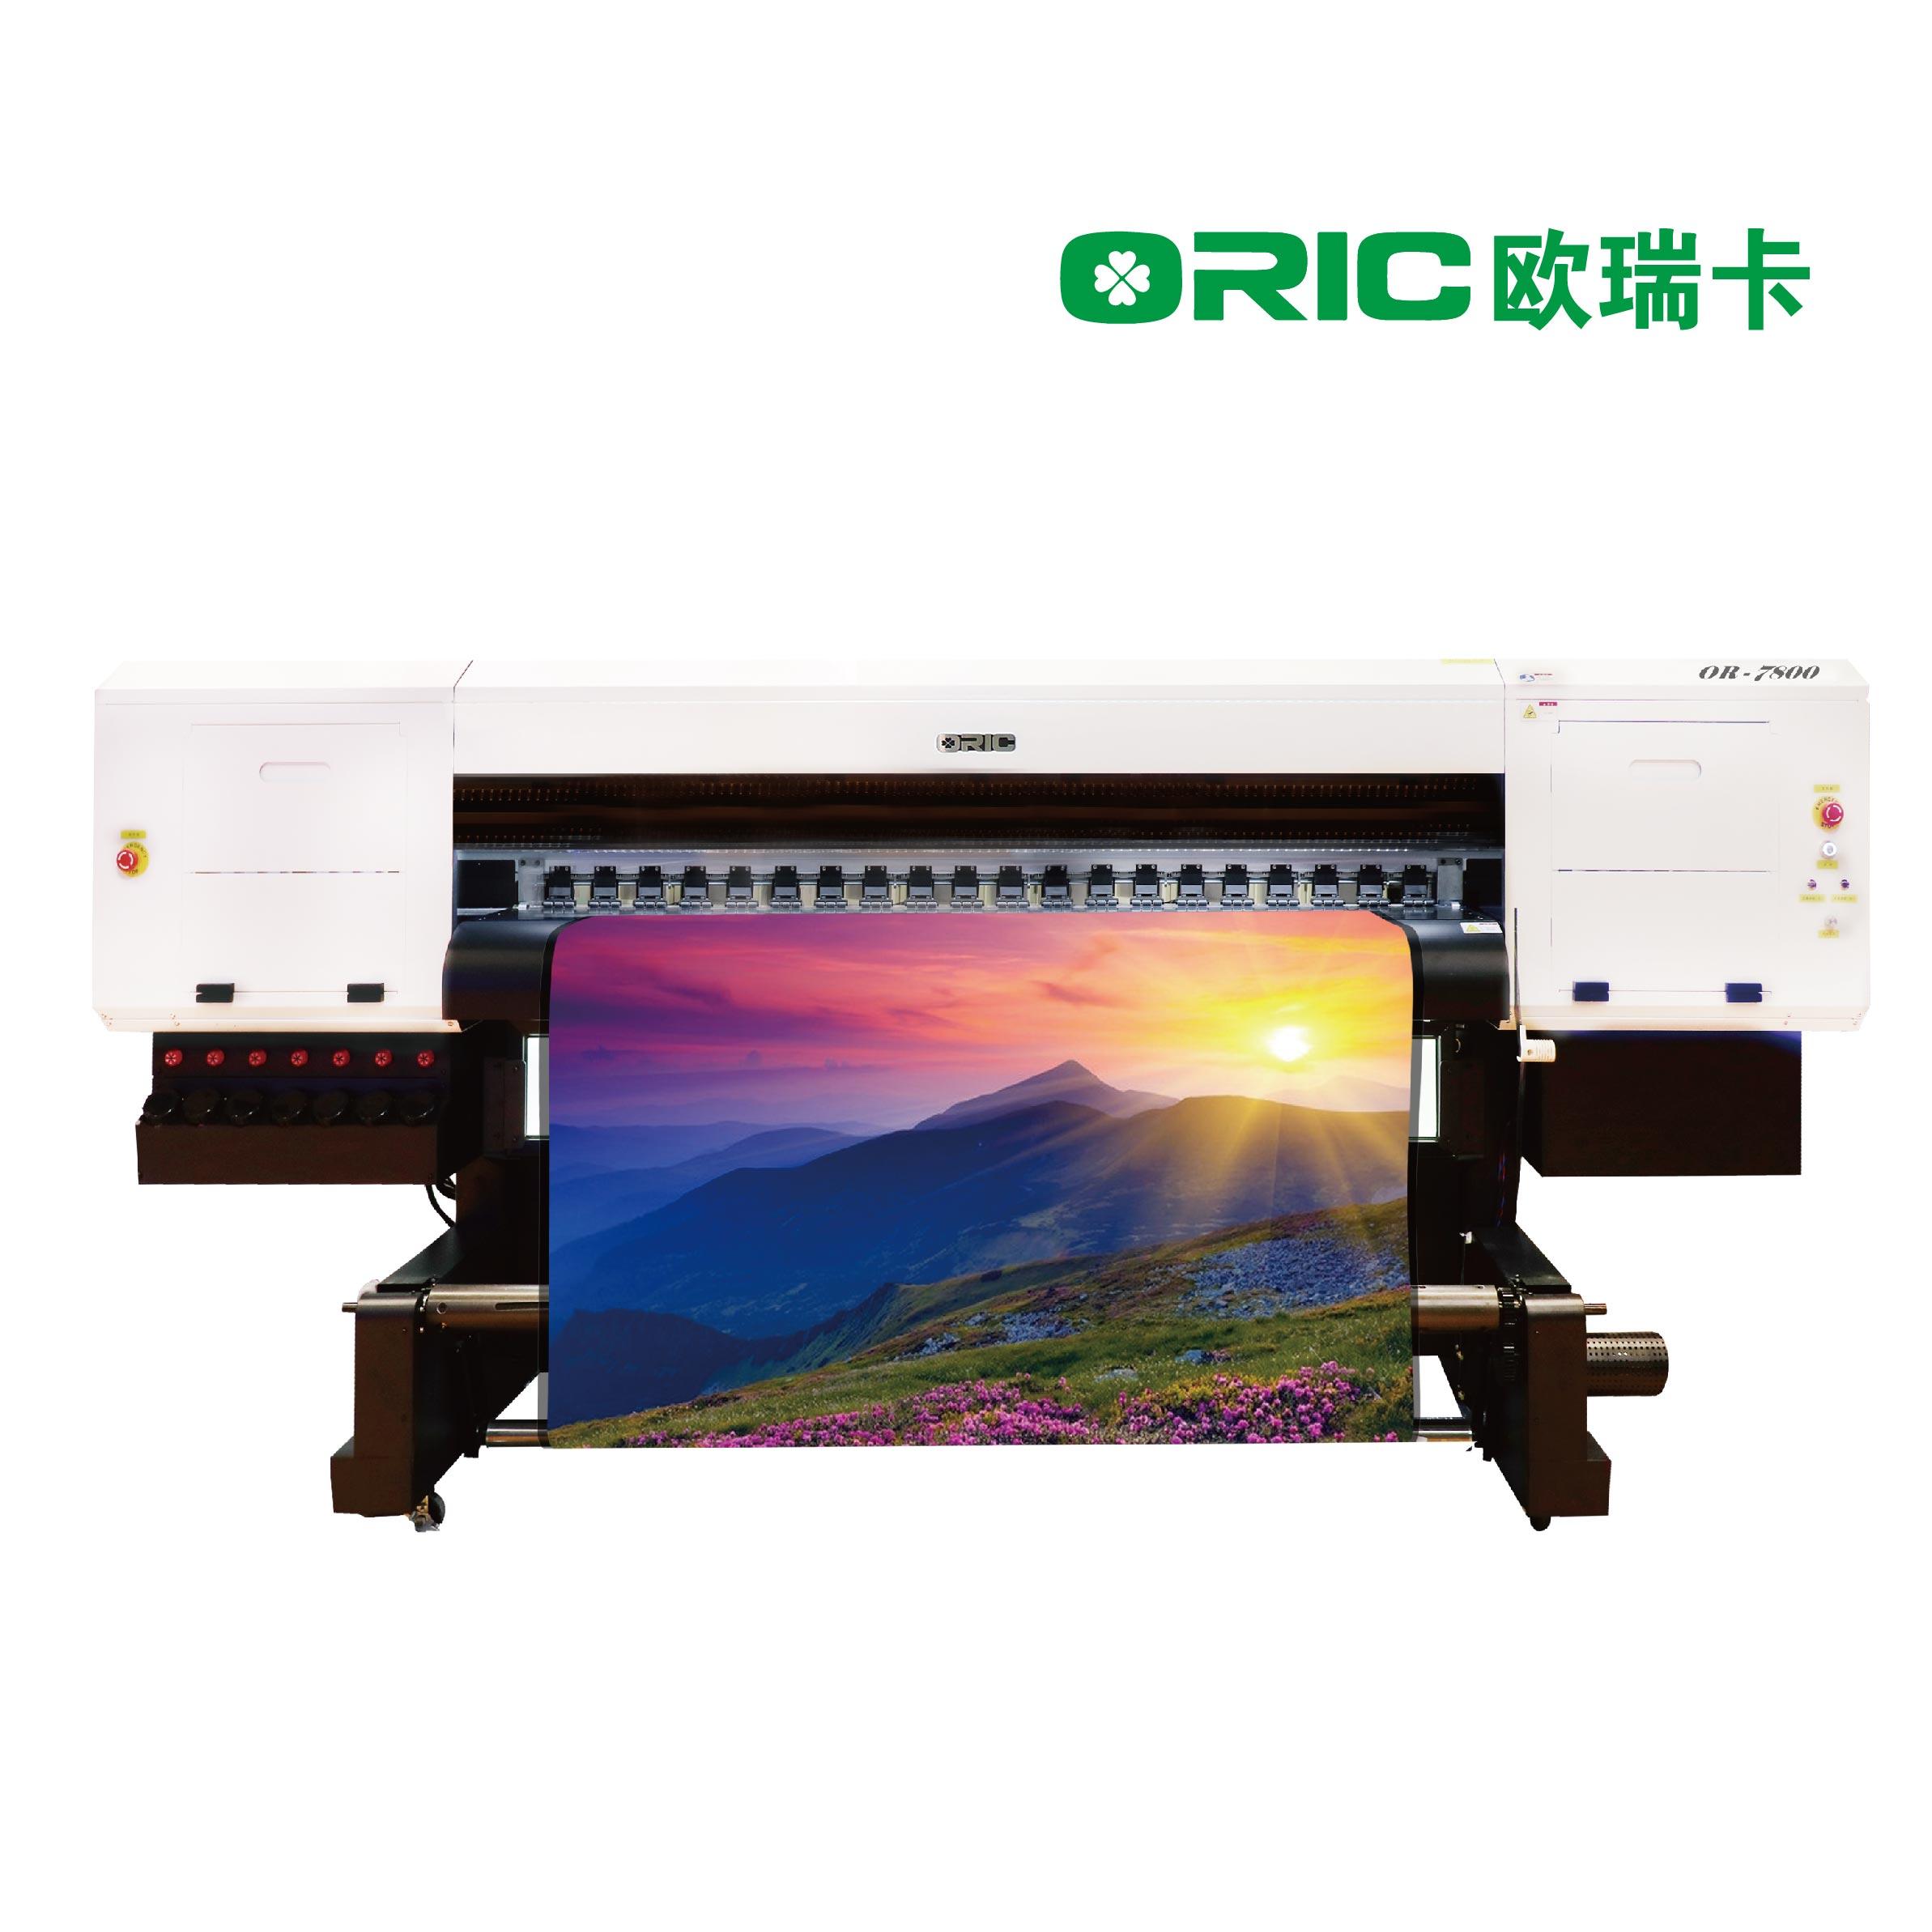 ORIC -机器图片 -new-15